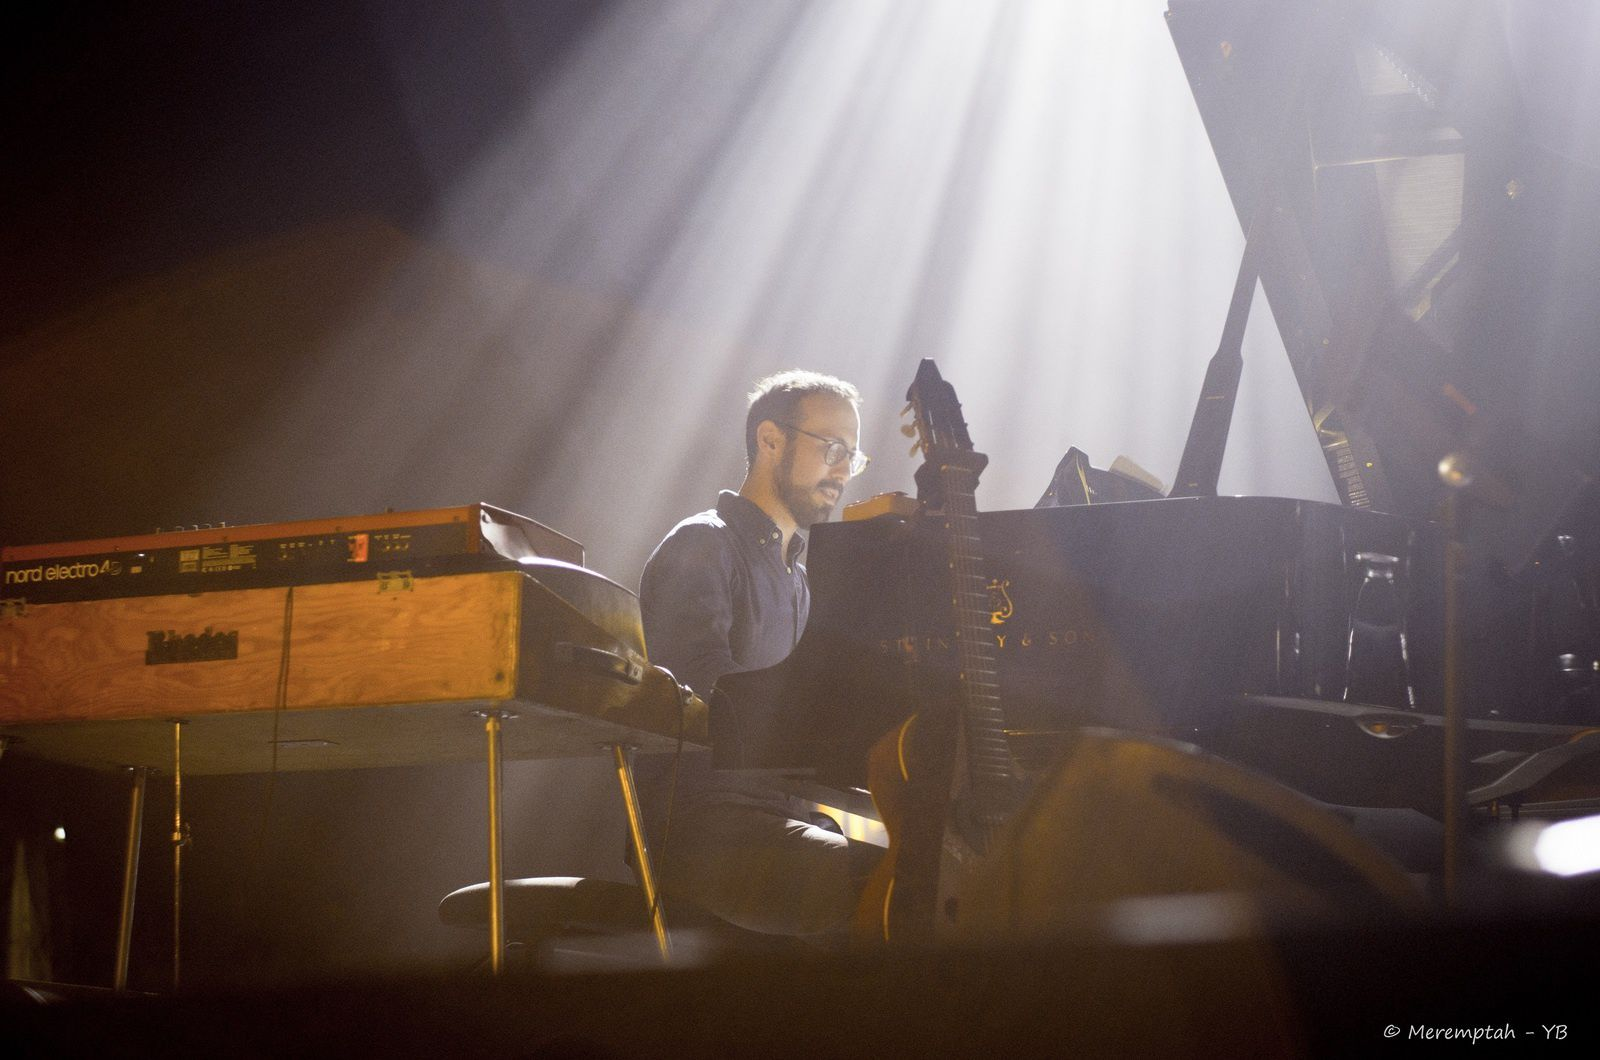 Yaron Herman au piano / Festival Jazz de Marciac / ©Meremptah